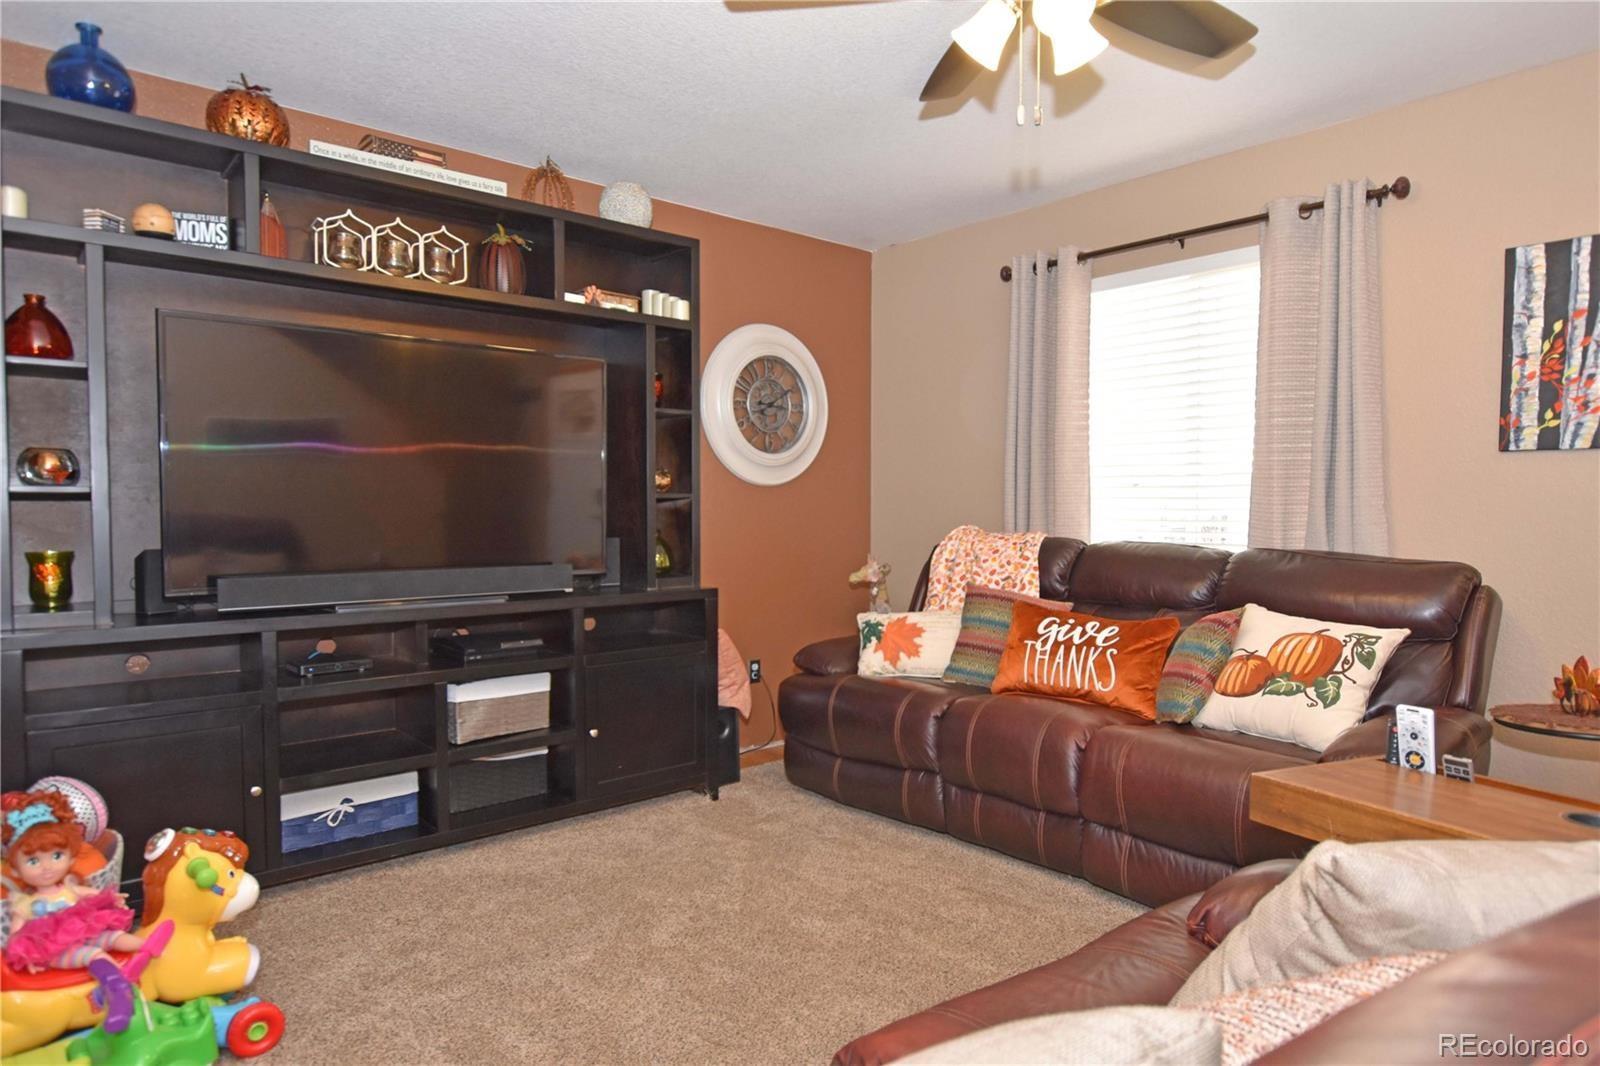 MLS# 9206879 - 6 - 3924 Eagles Nest Drive, Evans, CO 80620